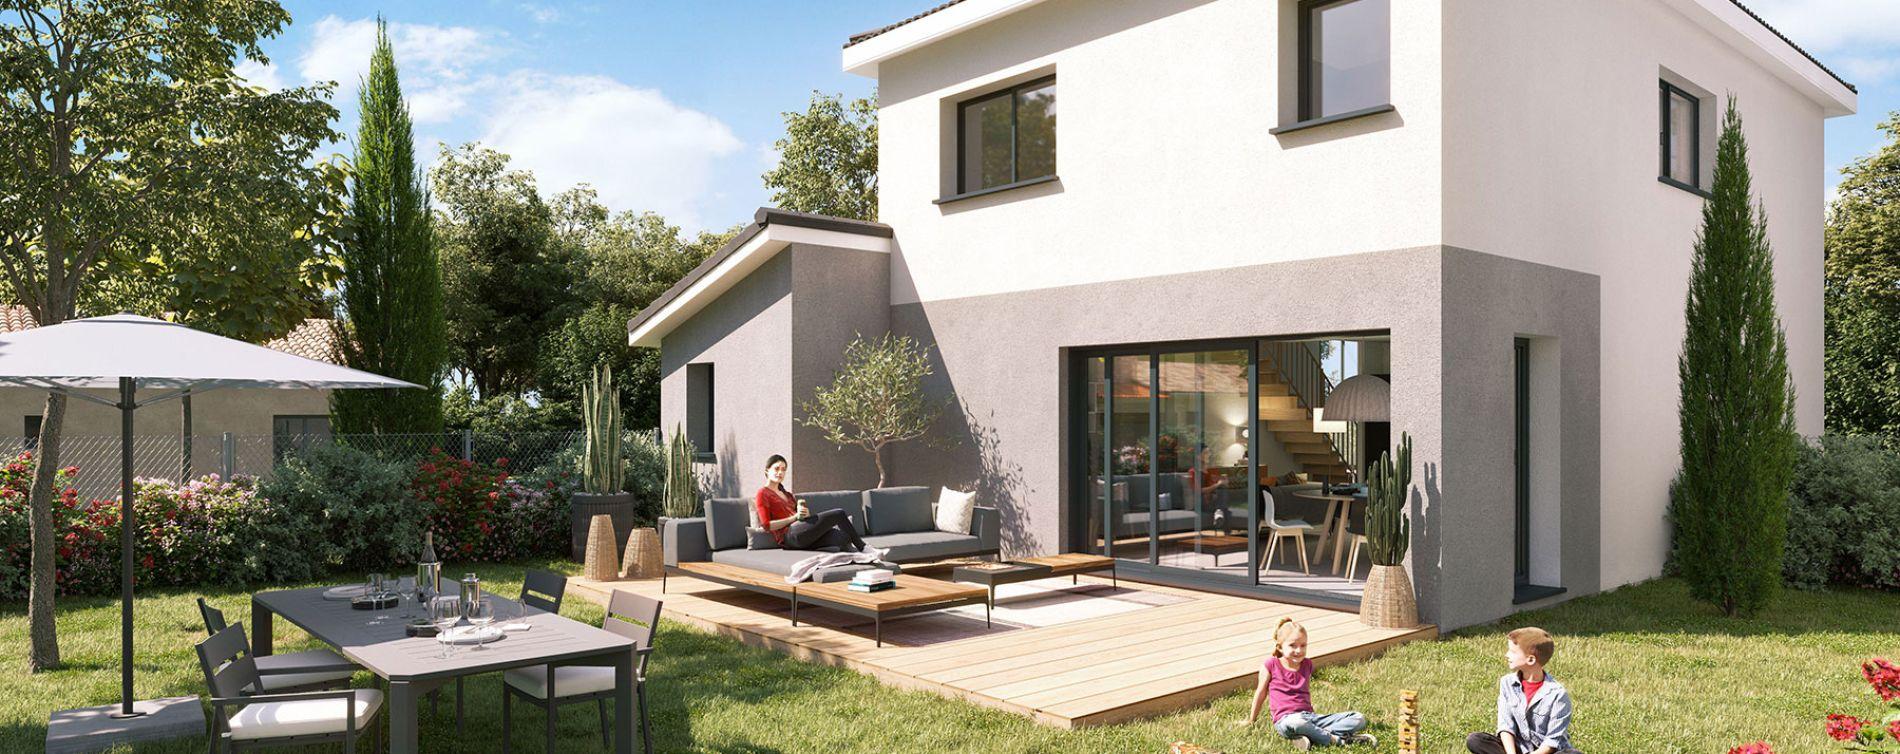 Mérignac : programme immobilier neuve « Villas 56 »